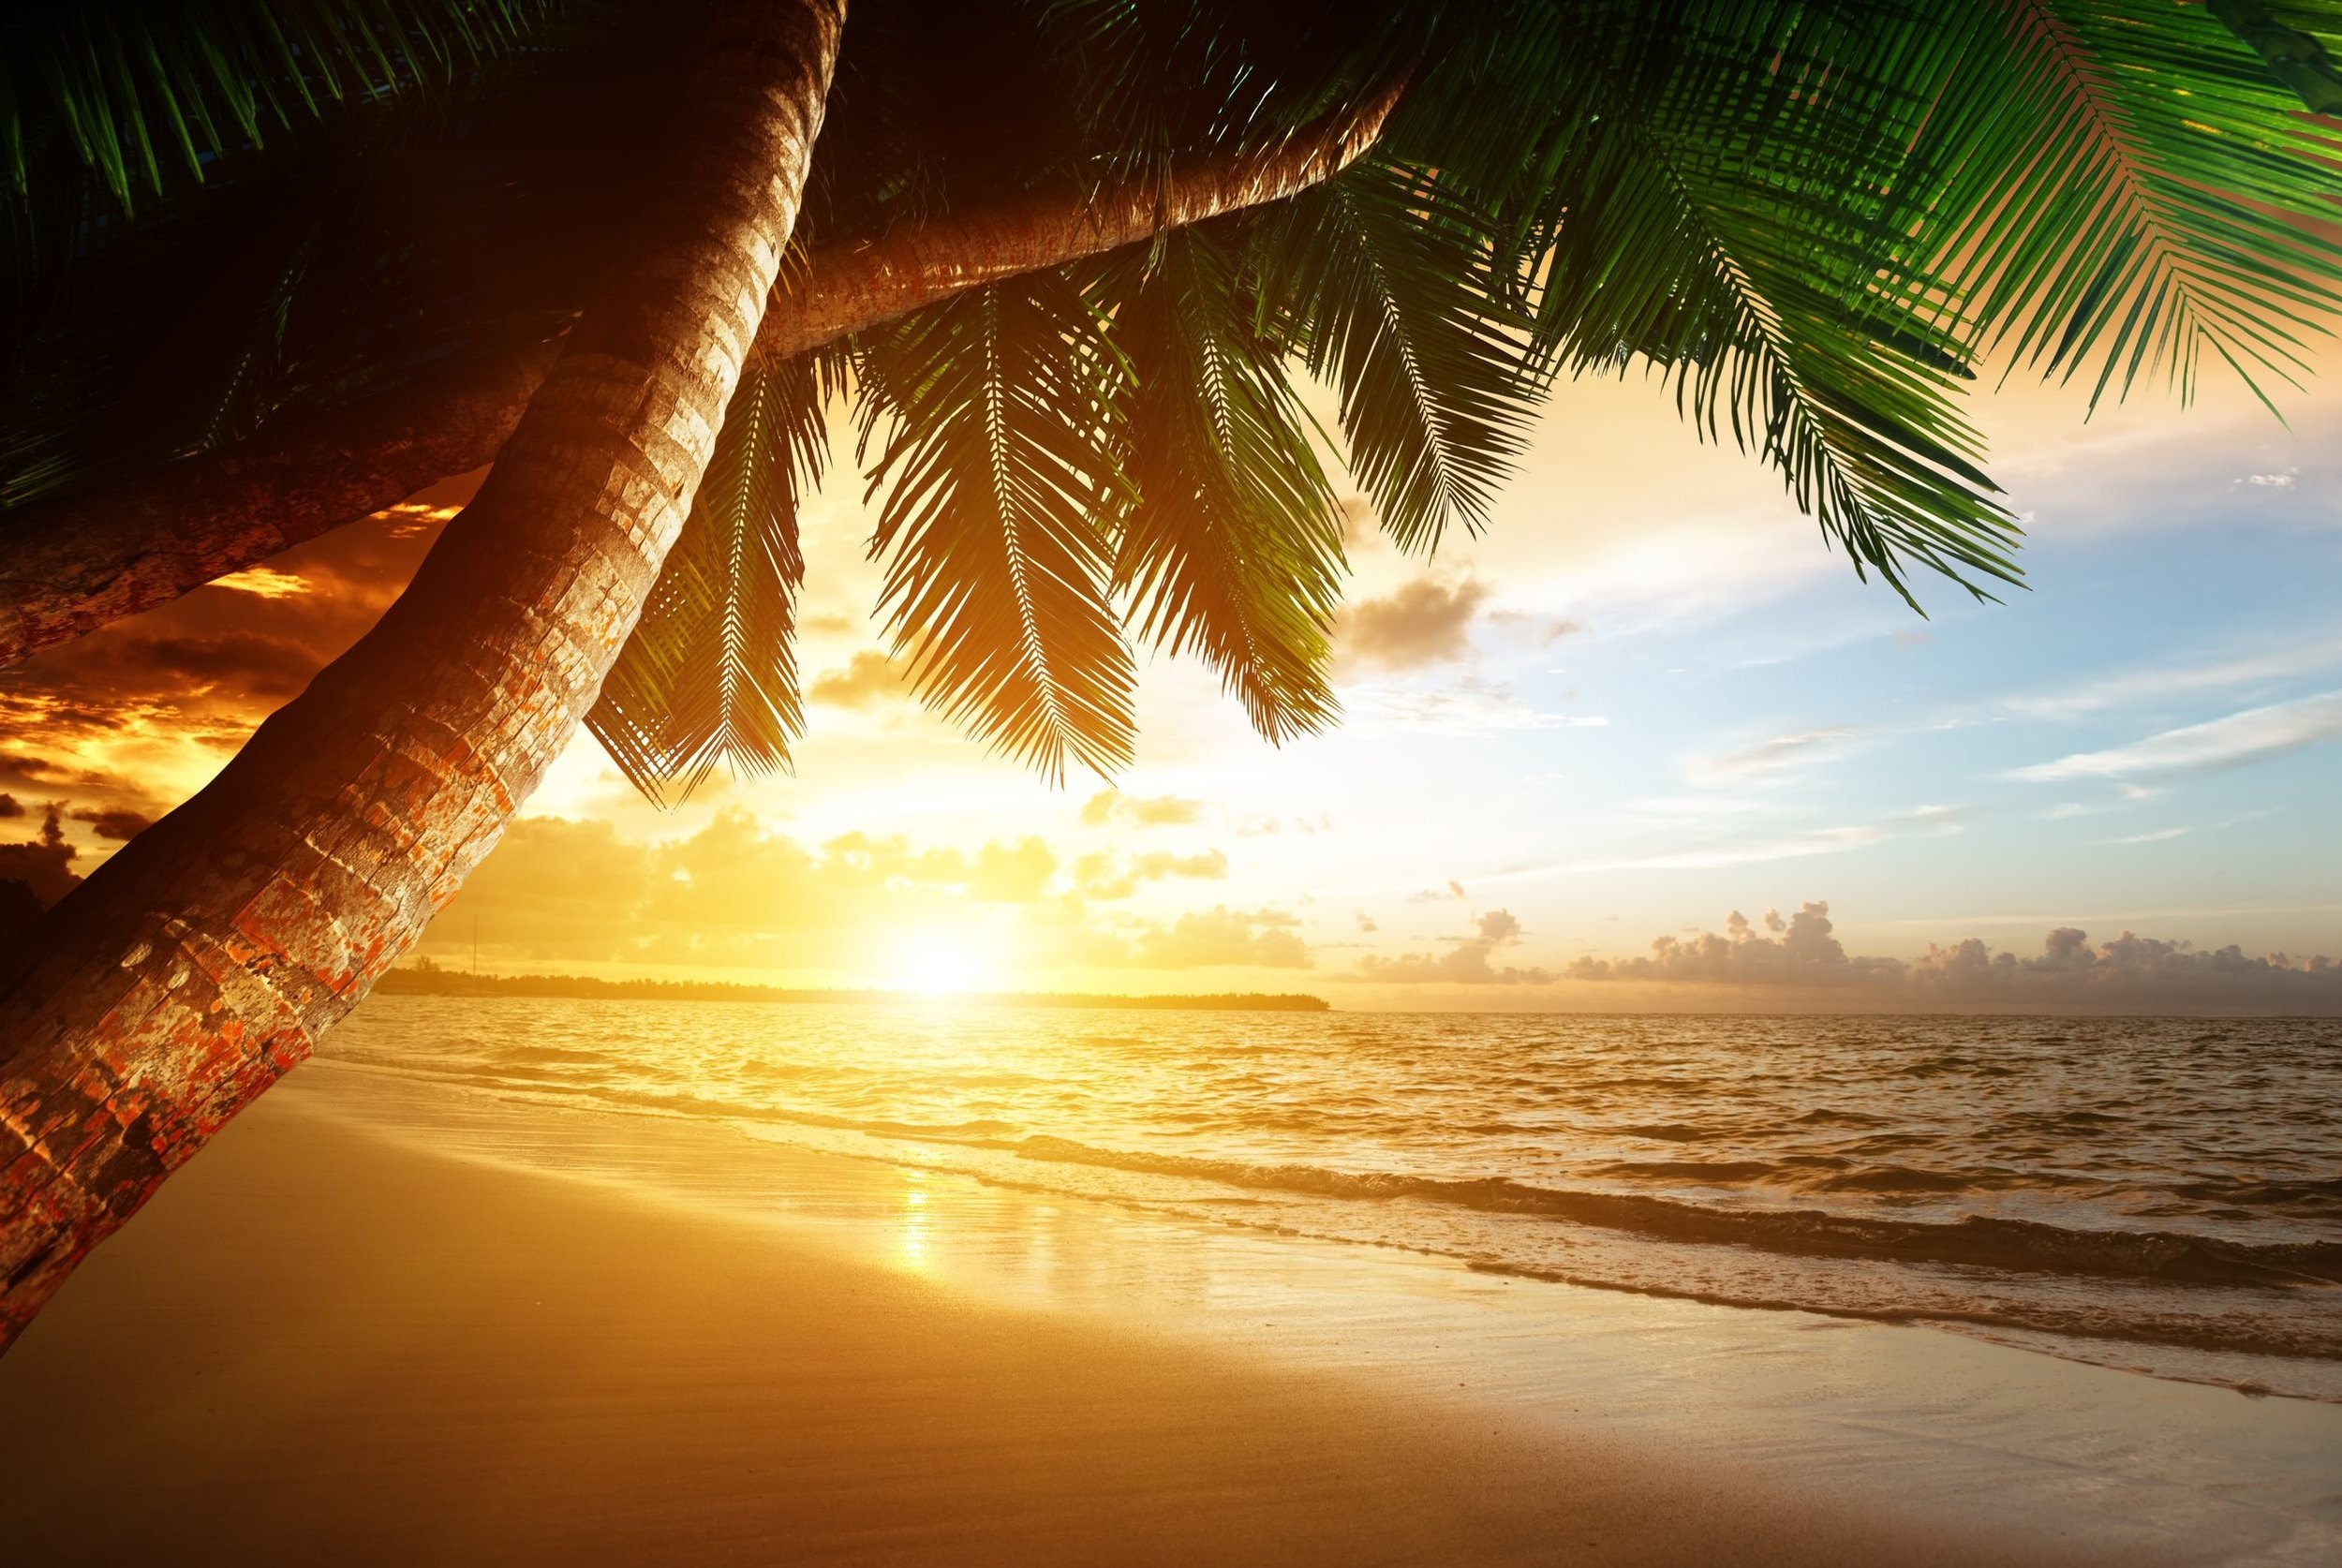 Palm Tree and Beach.jpg